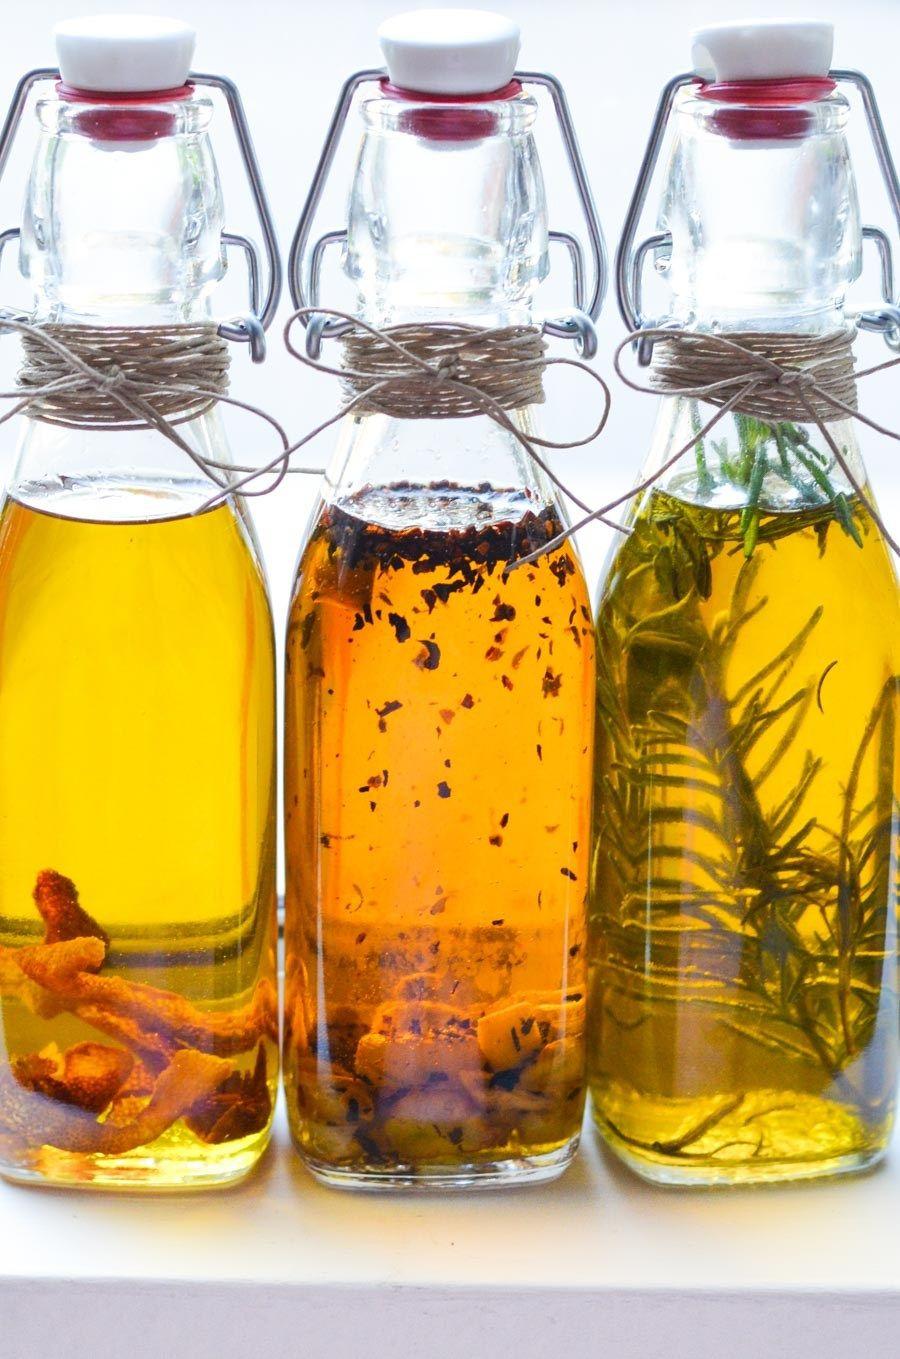 Homemade infused olive oils #oliveoils